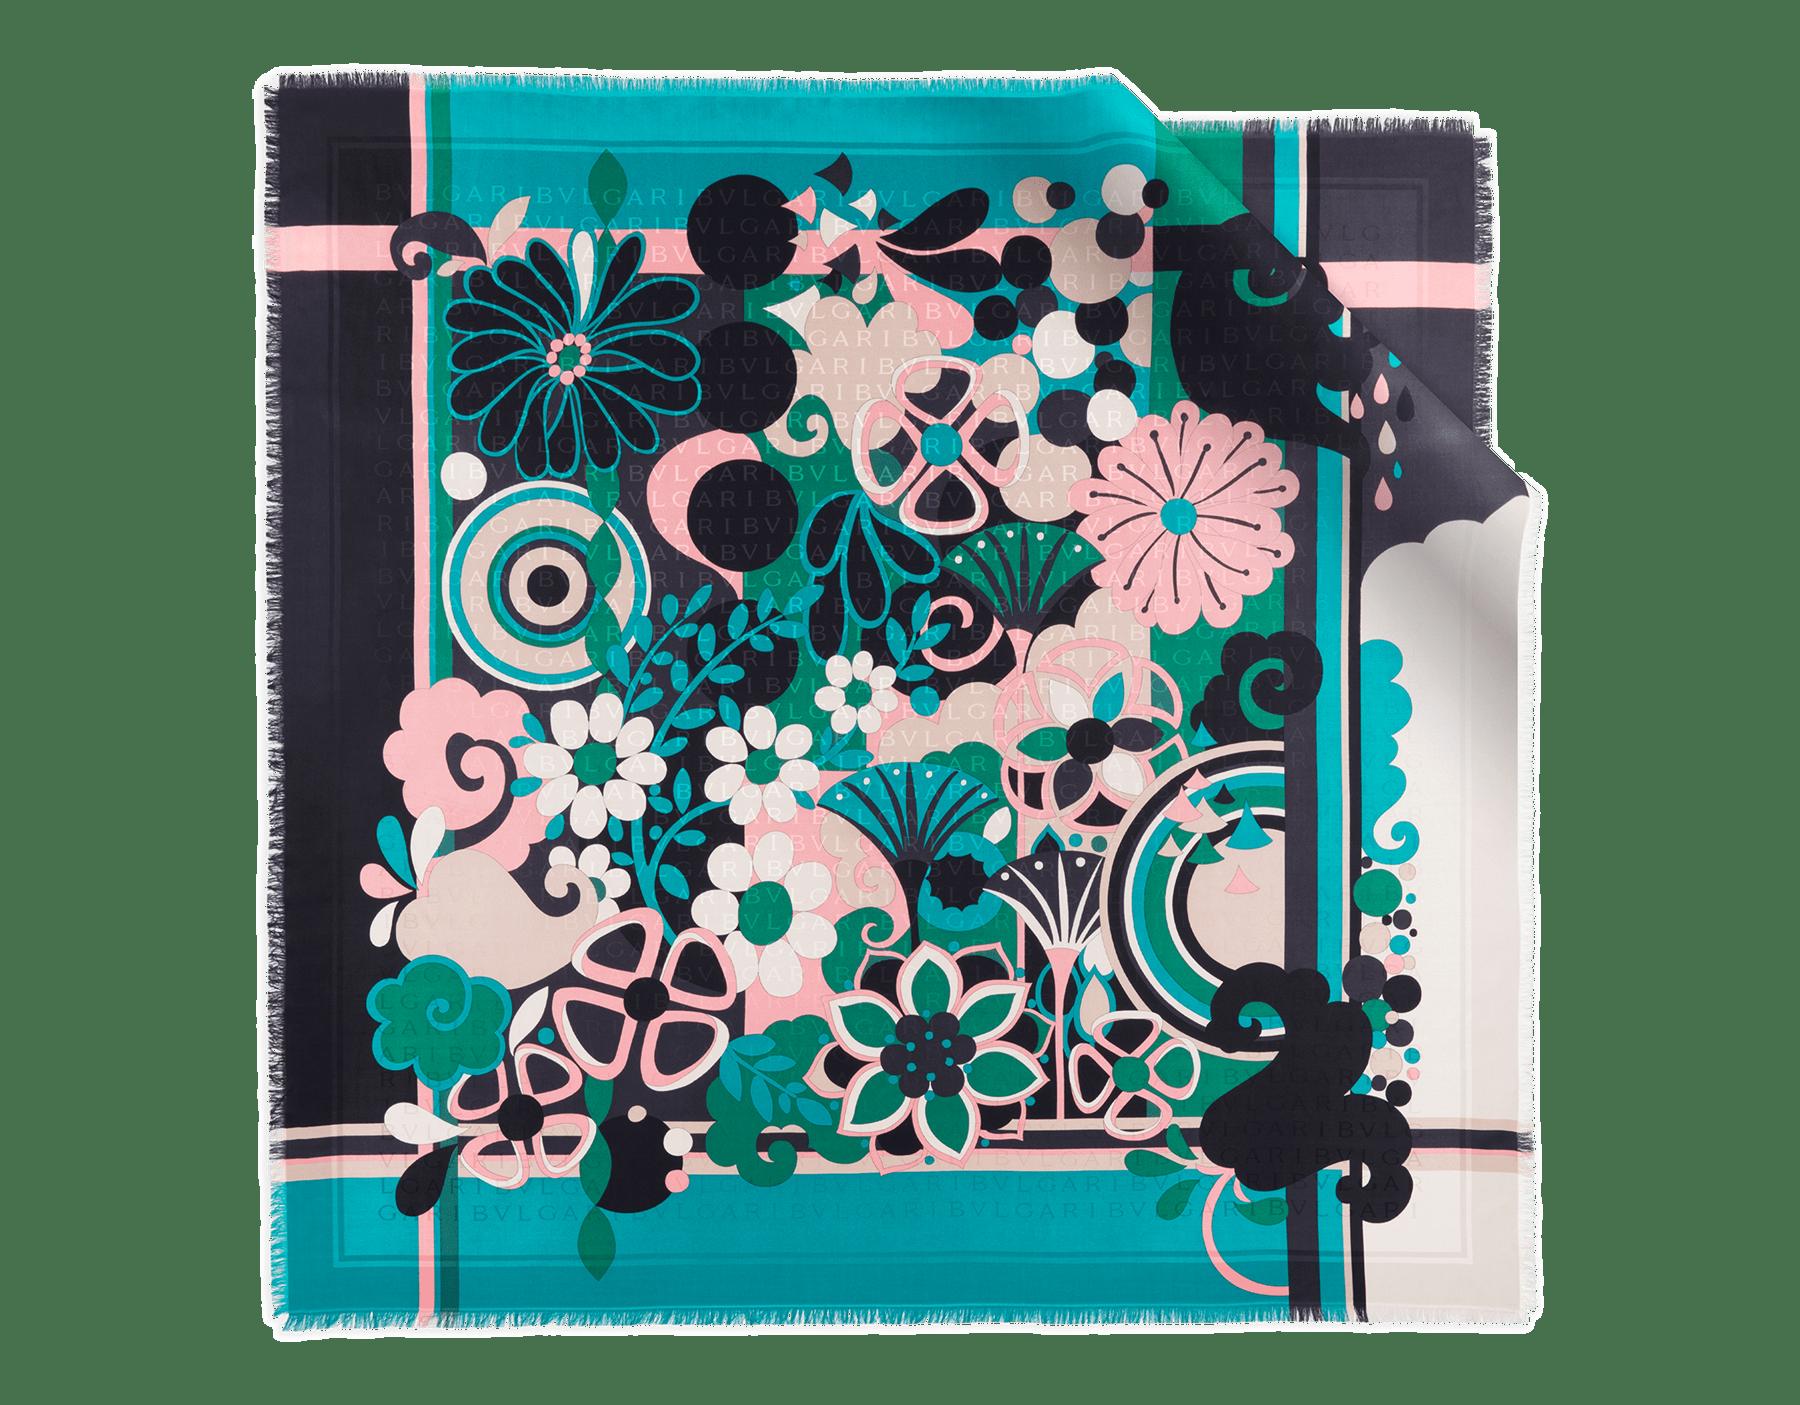 Tropical tourquoise Maxi Fiorever scarf in fine twill silk. 243761 image 1